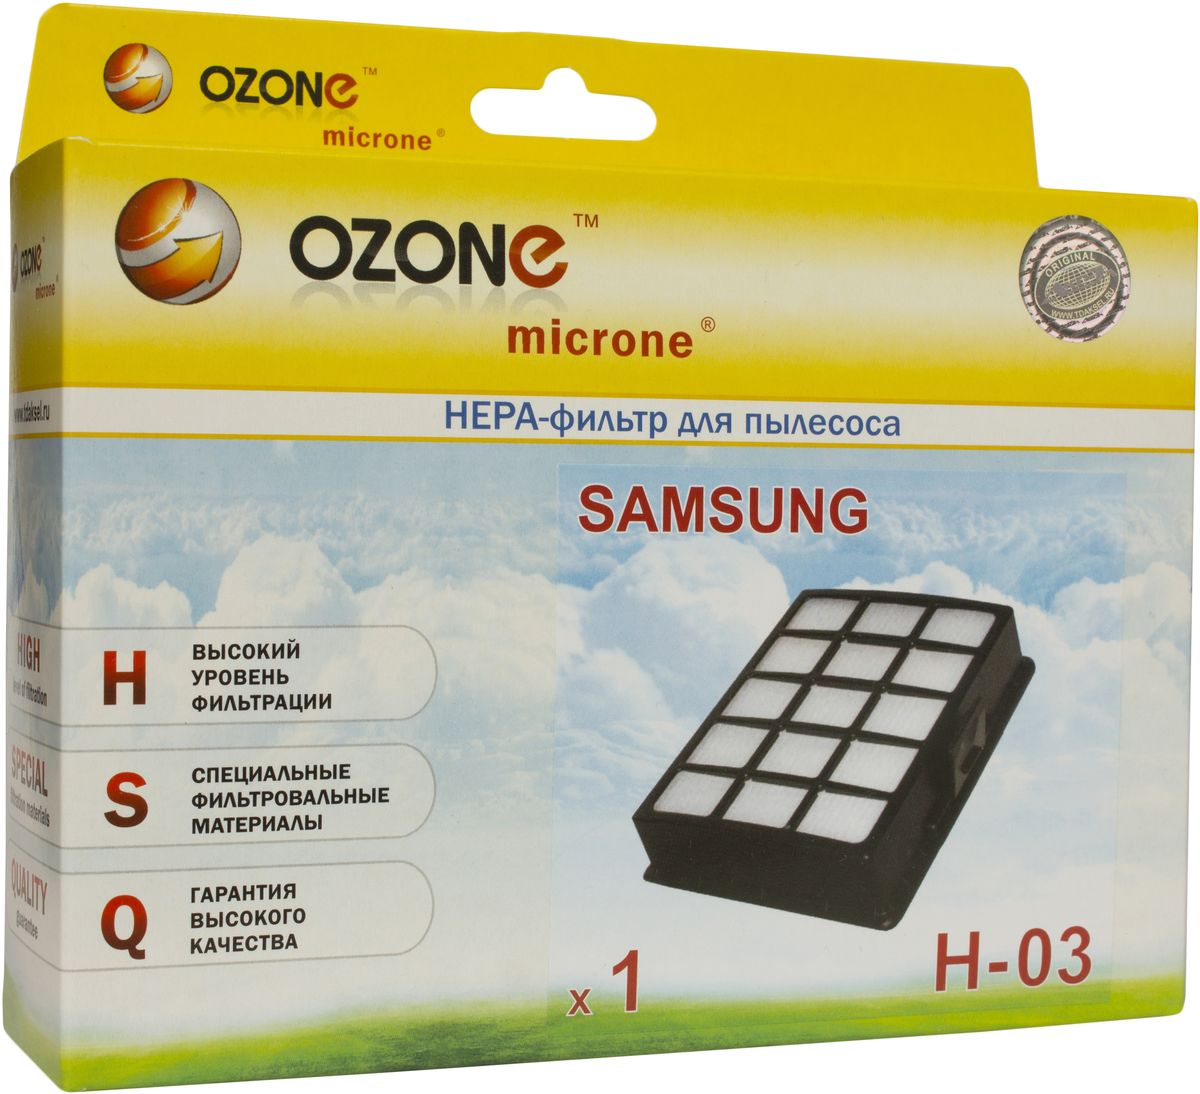 Ozone H-03 HEPA фильтр для пылесоса Samsung ozone microne h 19